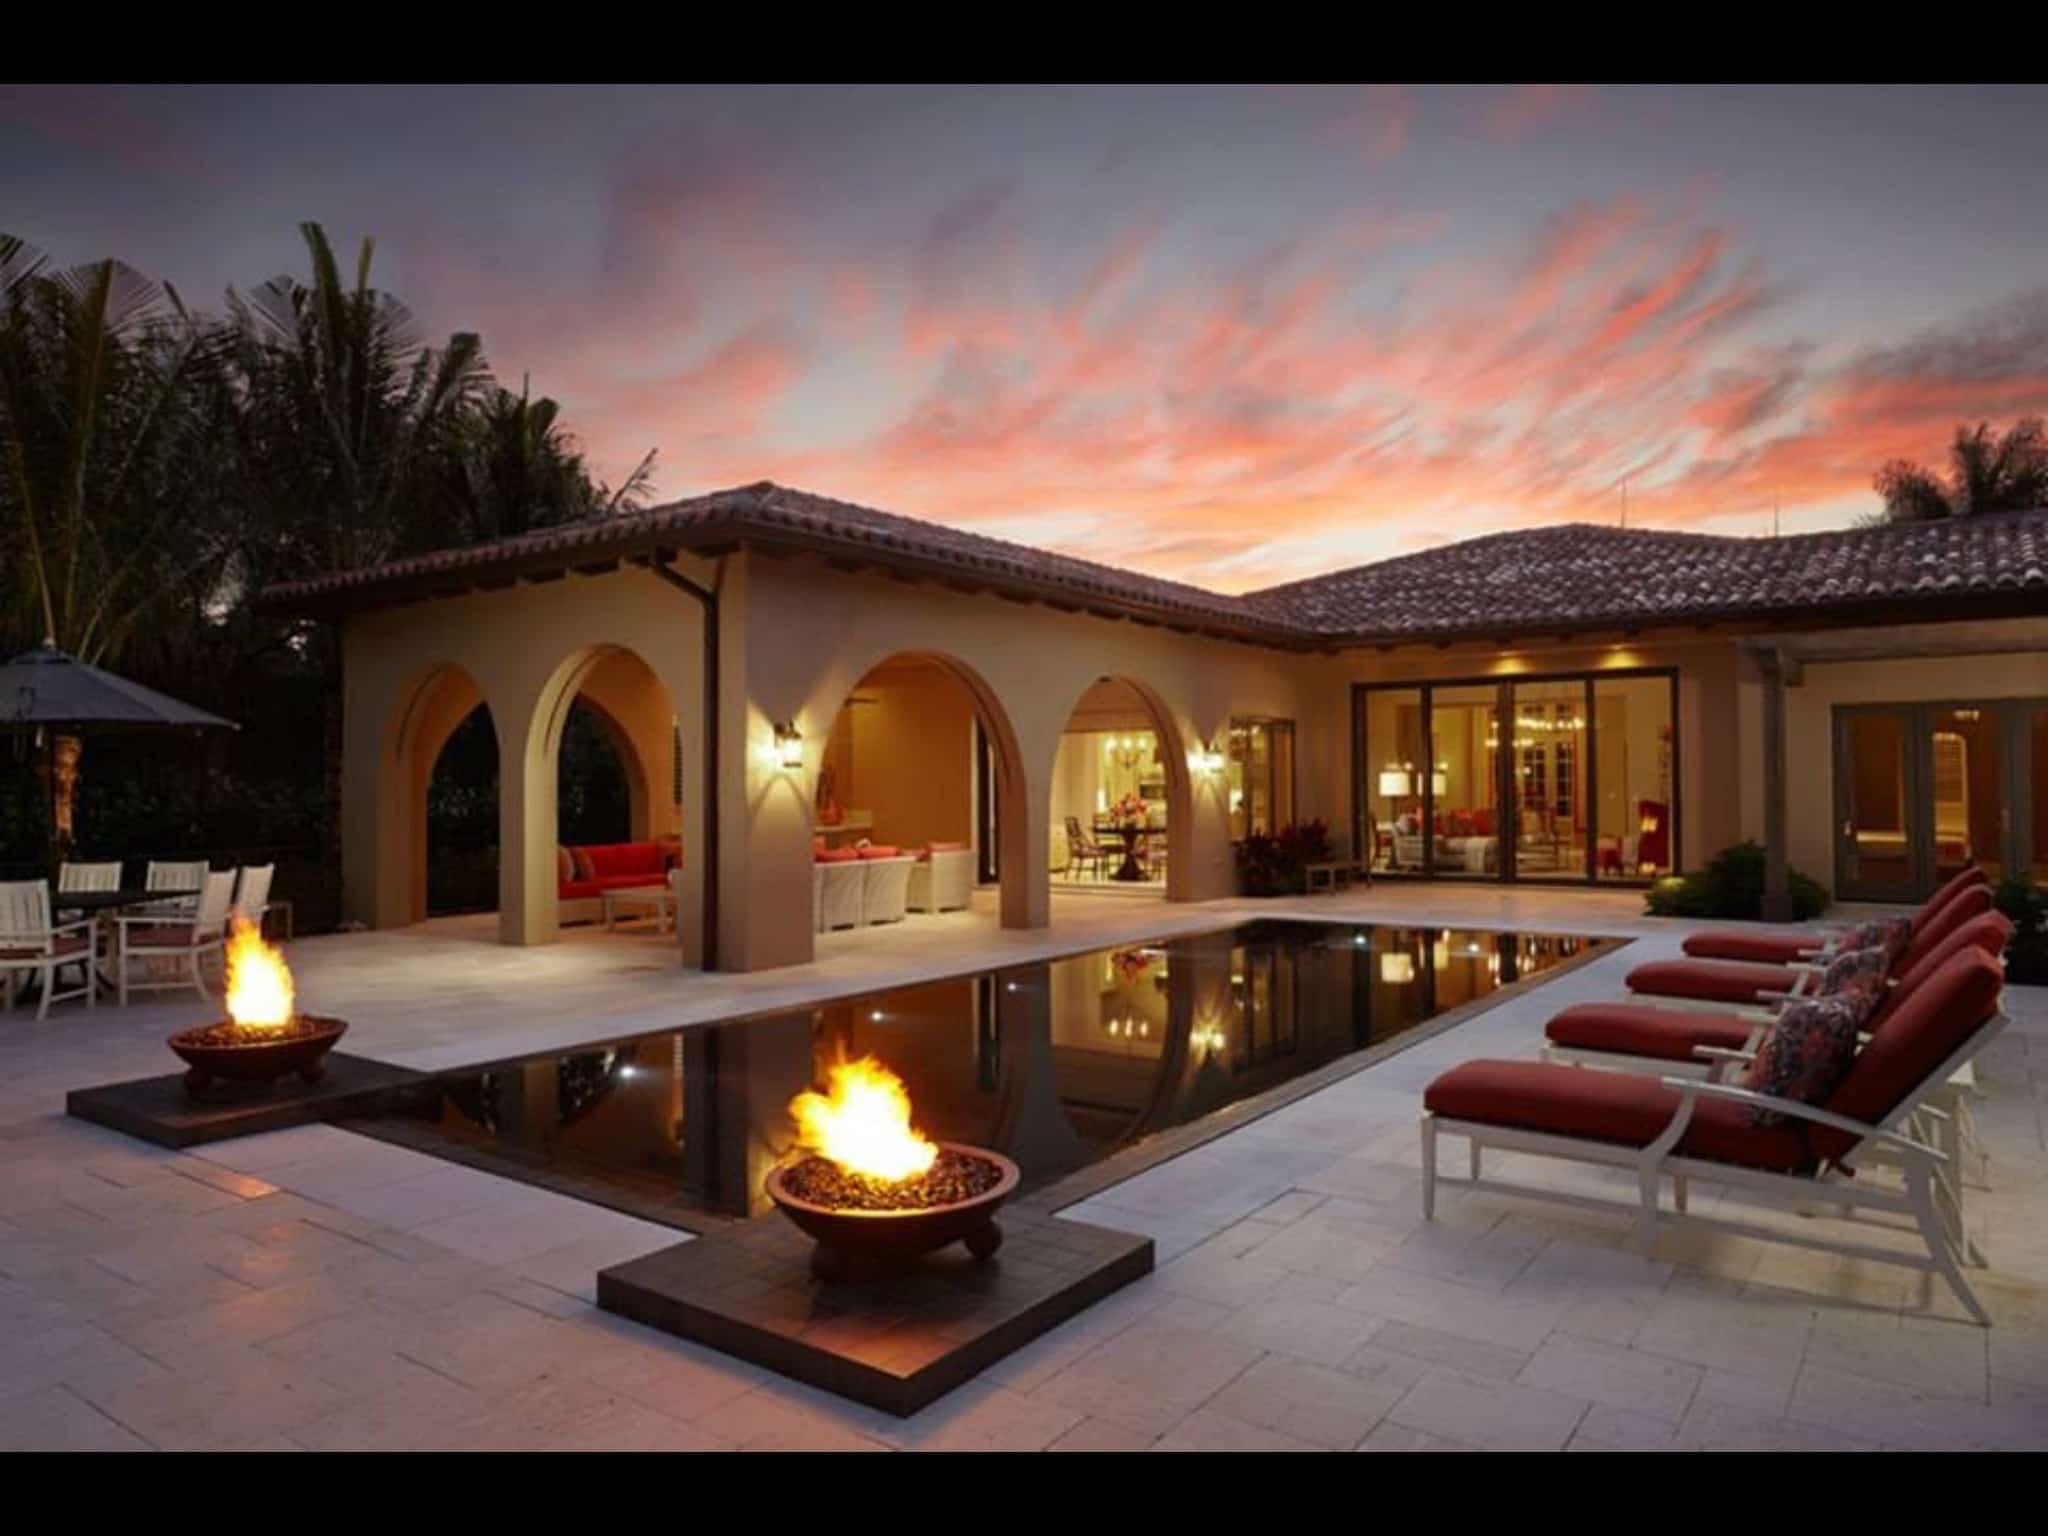 Marvelous Pool & Spa Installation